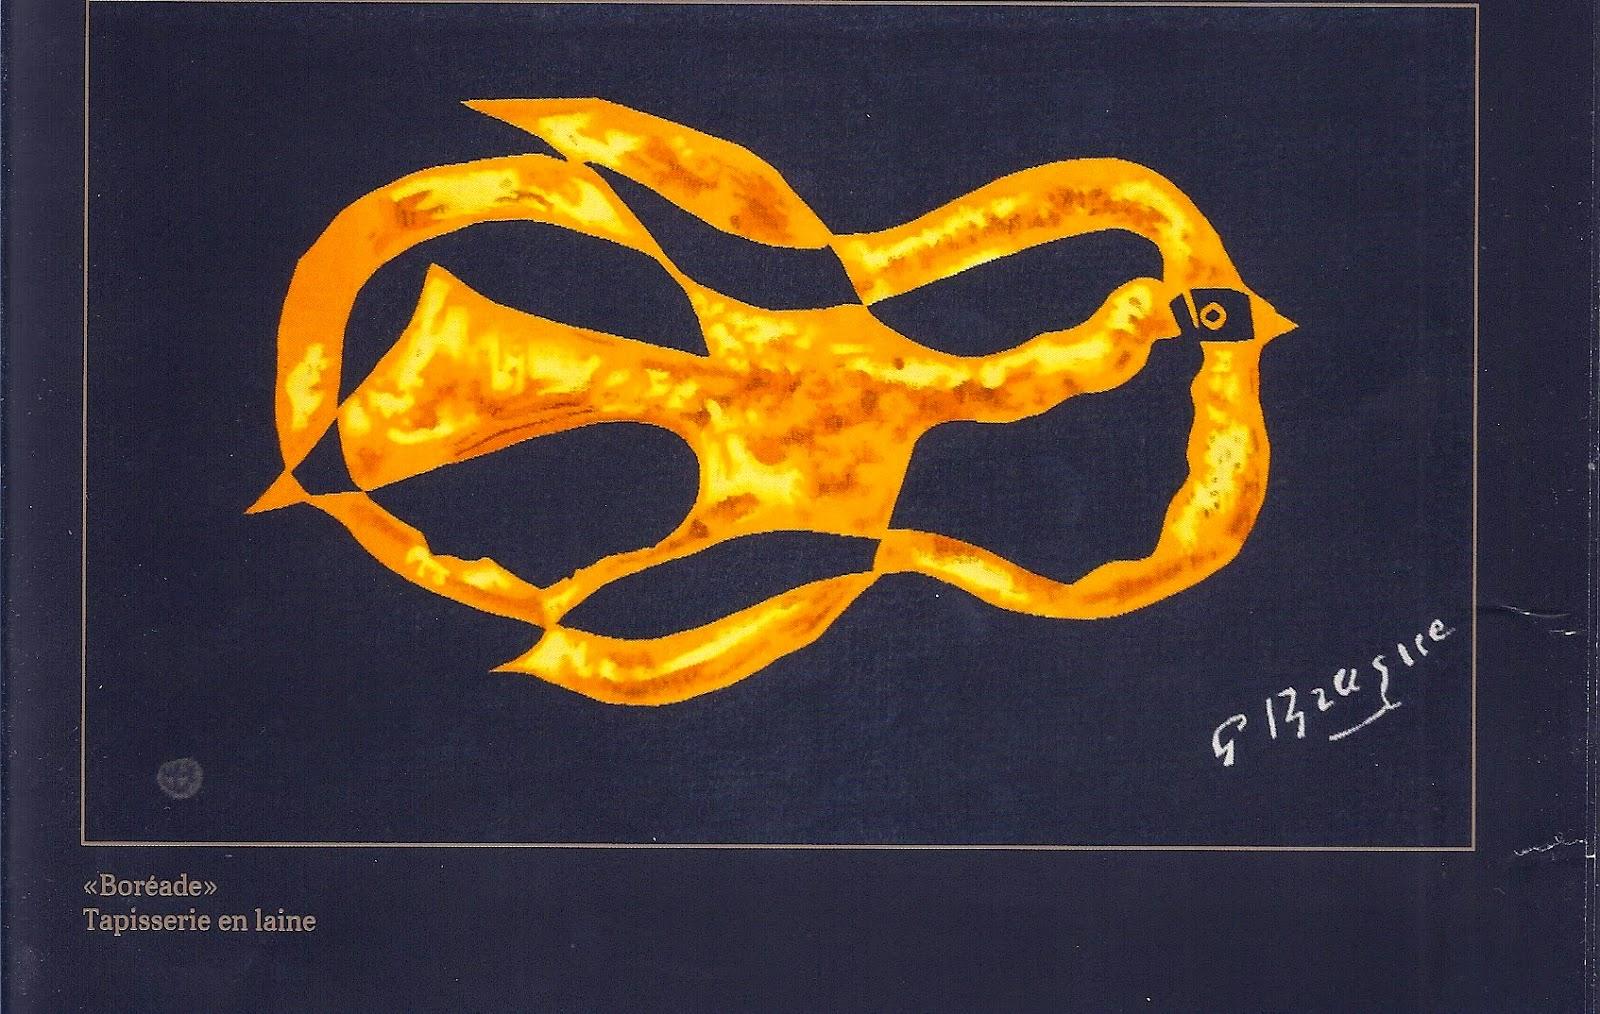 La c te d 39 azur georges braque toujours for Braque oeuvres